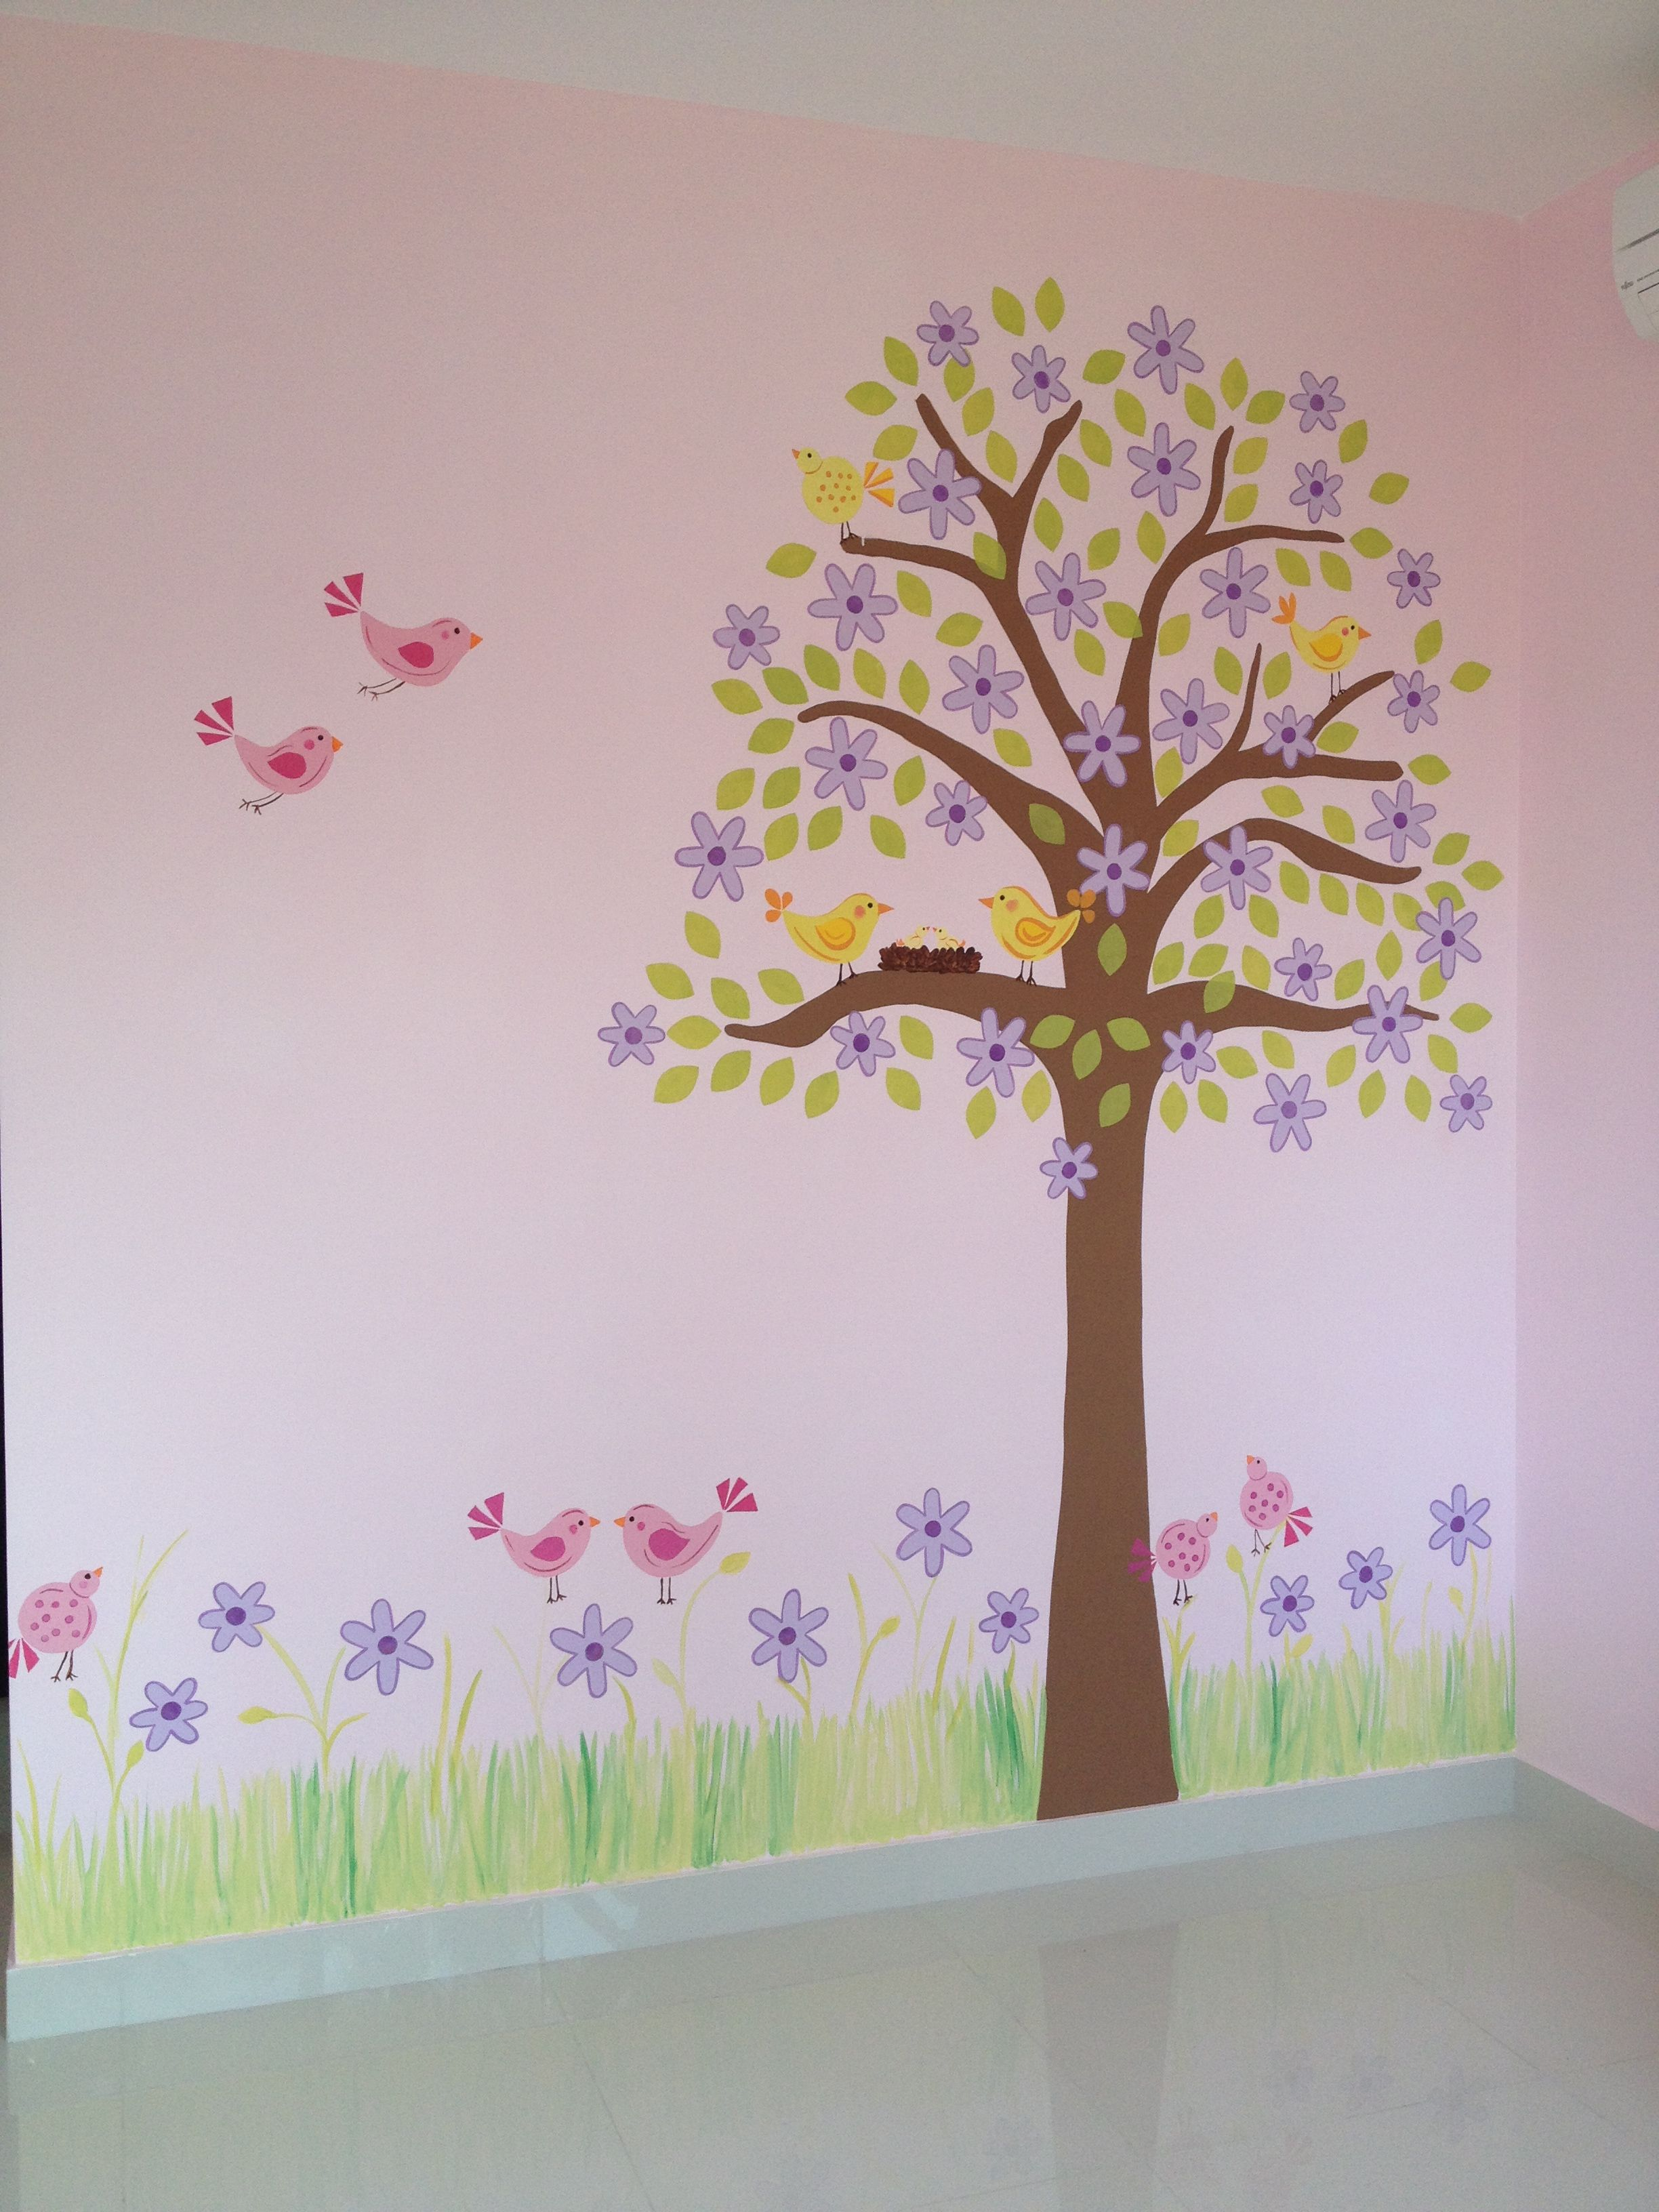 Murales de pared pintados a mano rboles de pajaritos - Murales pintados a mano ...